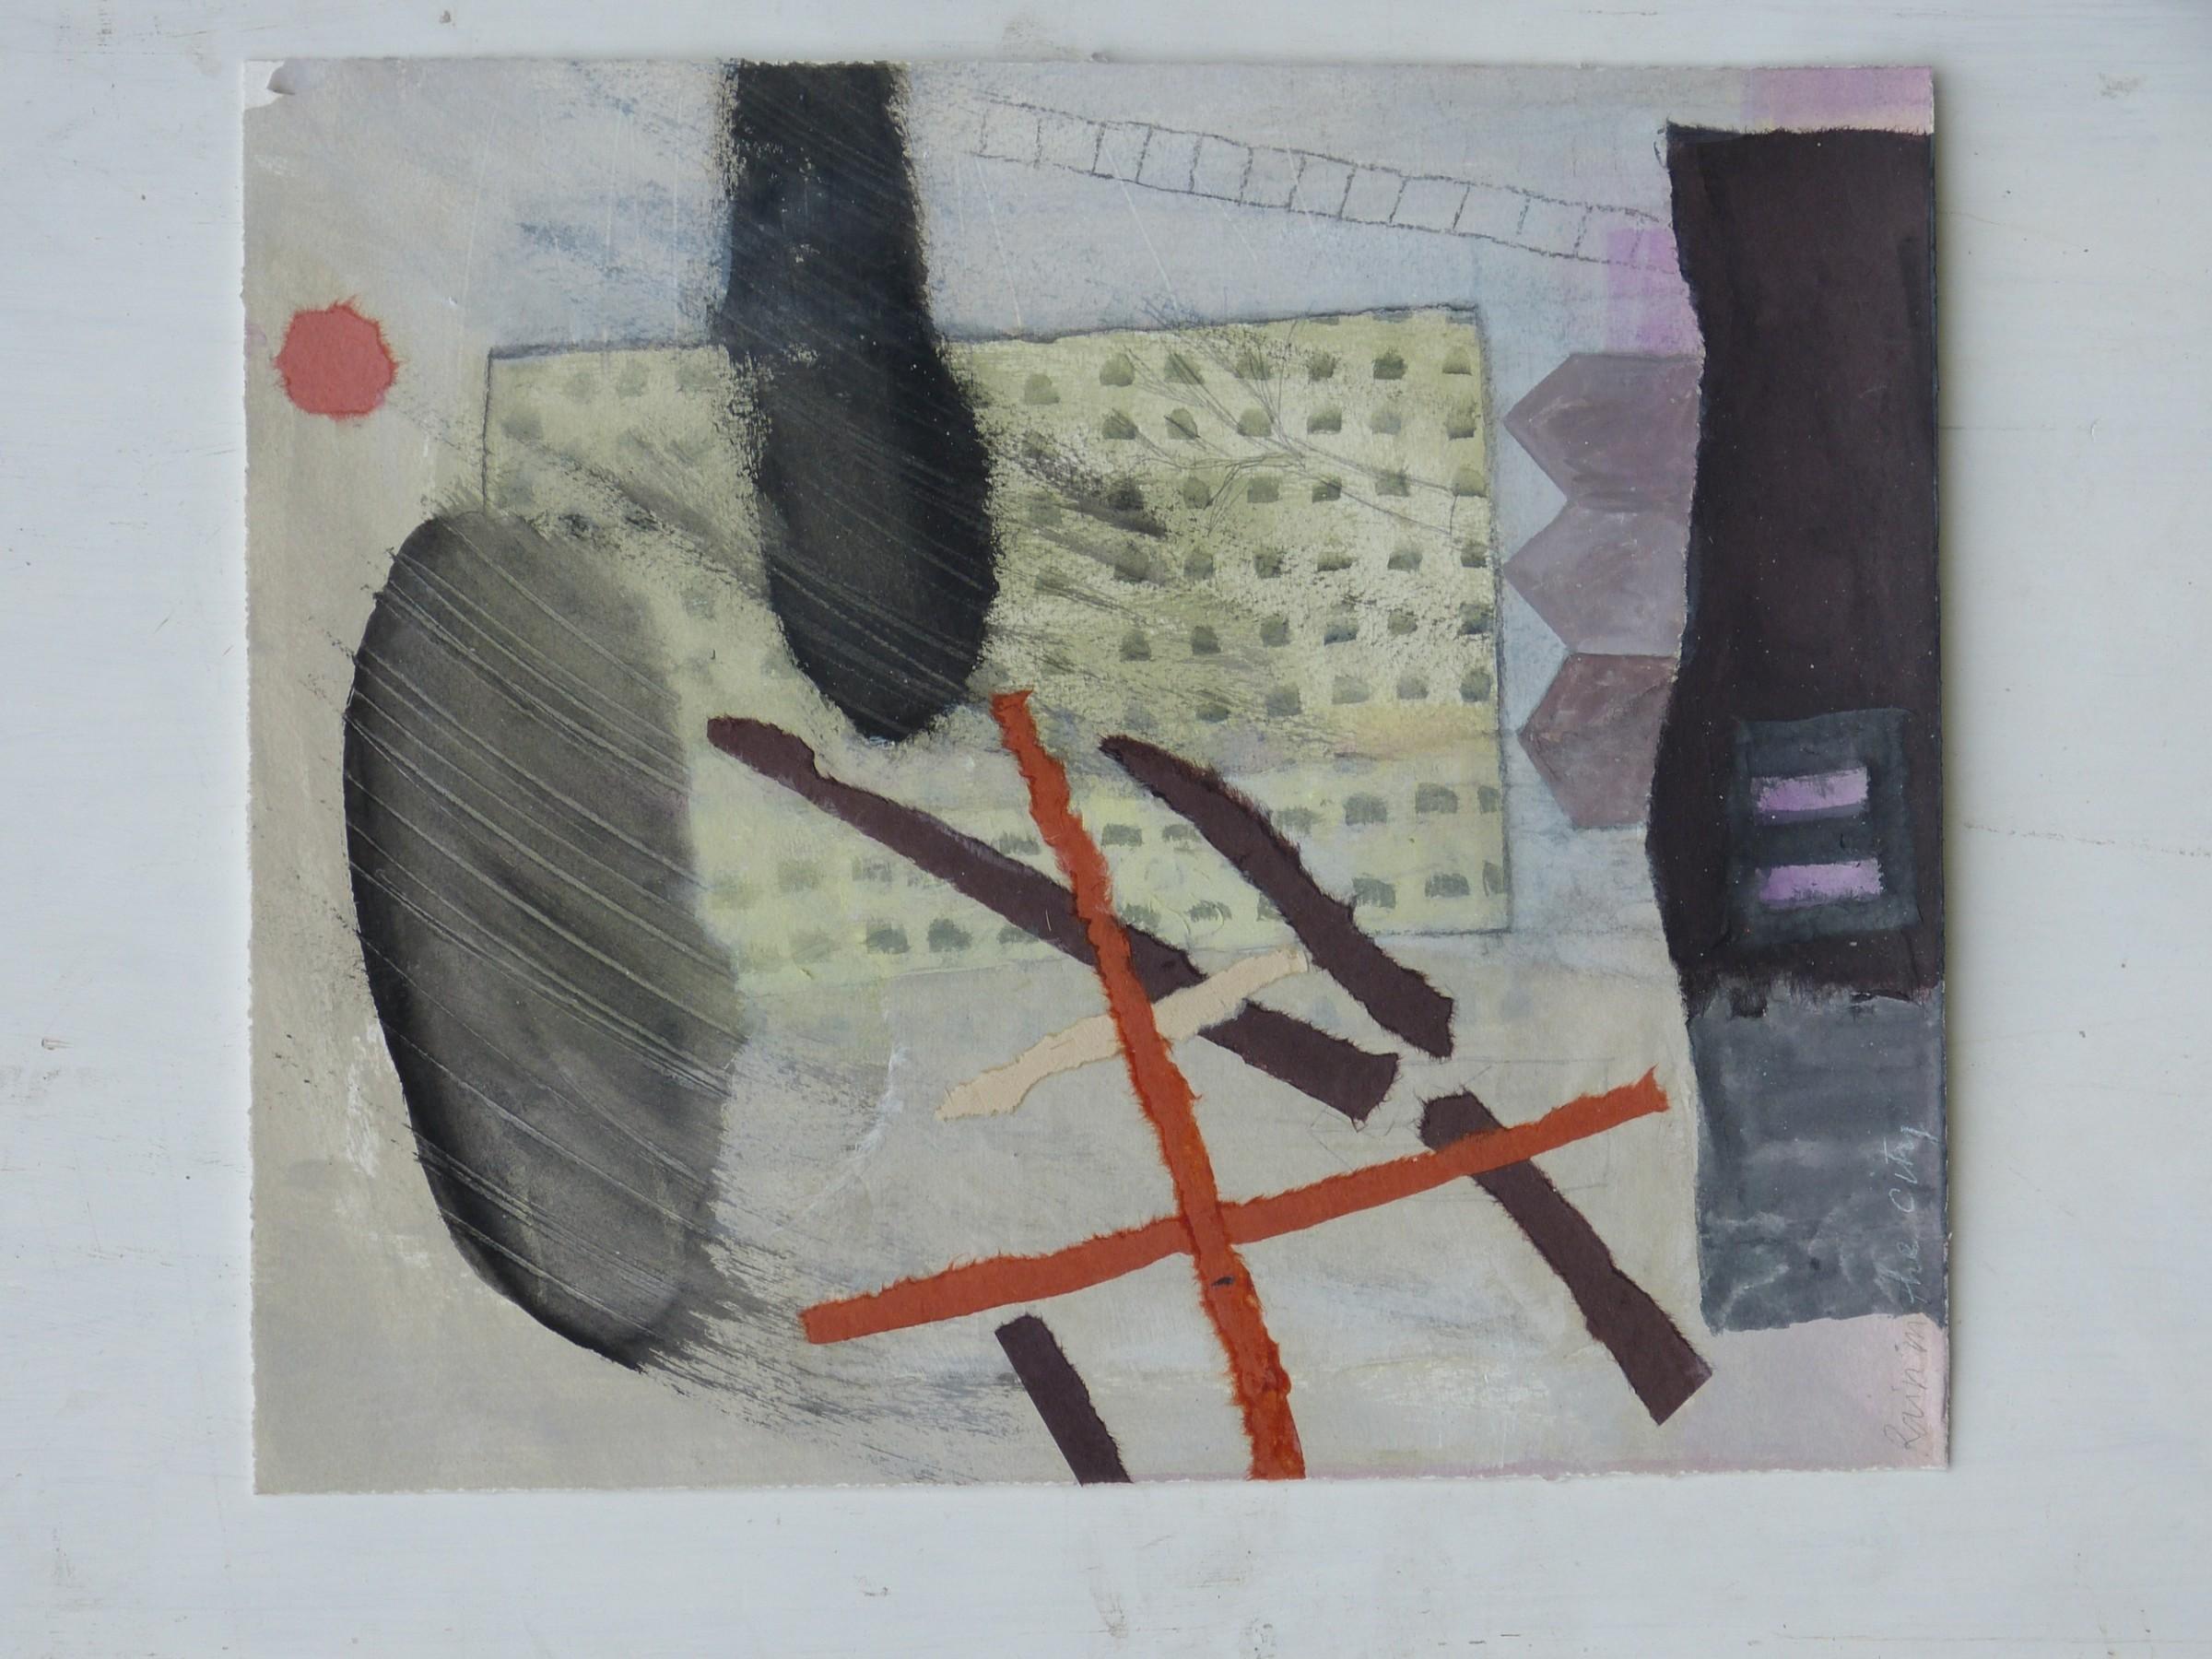 <span class=&#34;link fancybox-details-link&#34;><a href=&#34;/exhibitions/24/works/artworks_standalone10739/&#34;>View Detail Page</a></span><div class=&#34;artist&#34;><span class=&#34;artist&#34;><strong>Caroline McAdam Clark</strong></span></div><div class=&#34;title&#34;><em>Blick ins Chaos</em></div><div class=&#34;medium&#34;>watercolour, pencil & collage</div><div class=&#34;dimensions&#34;>55x47cm</div>